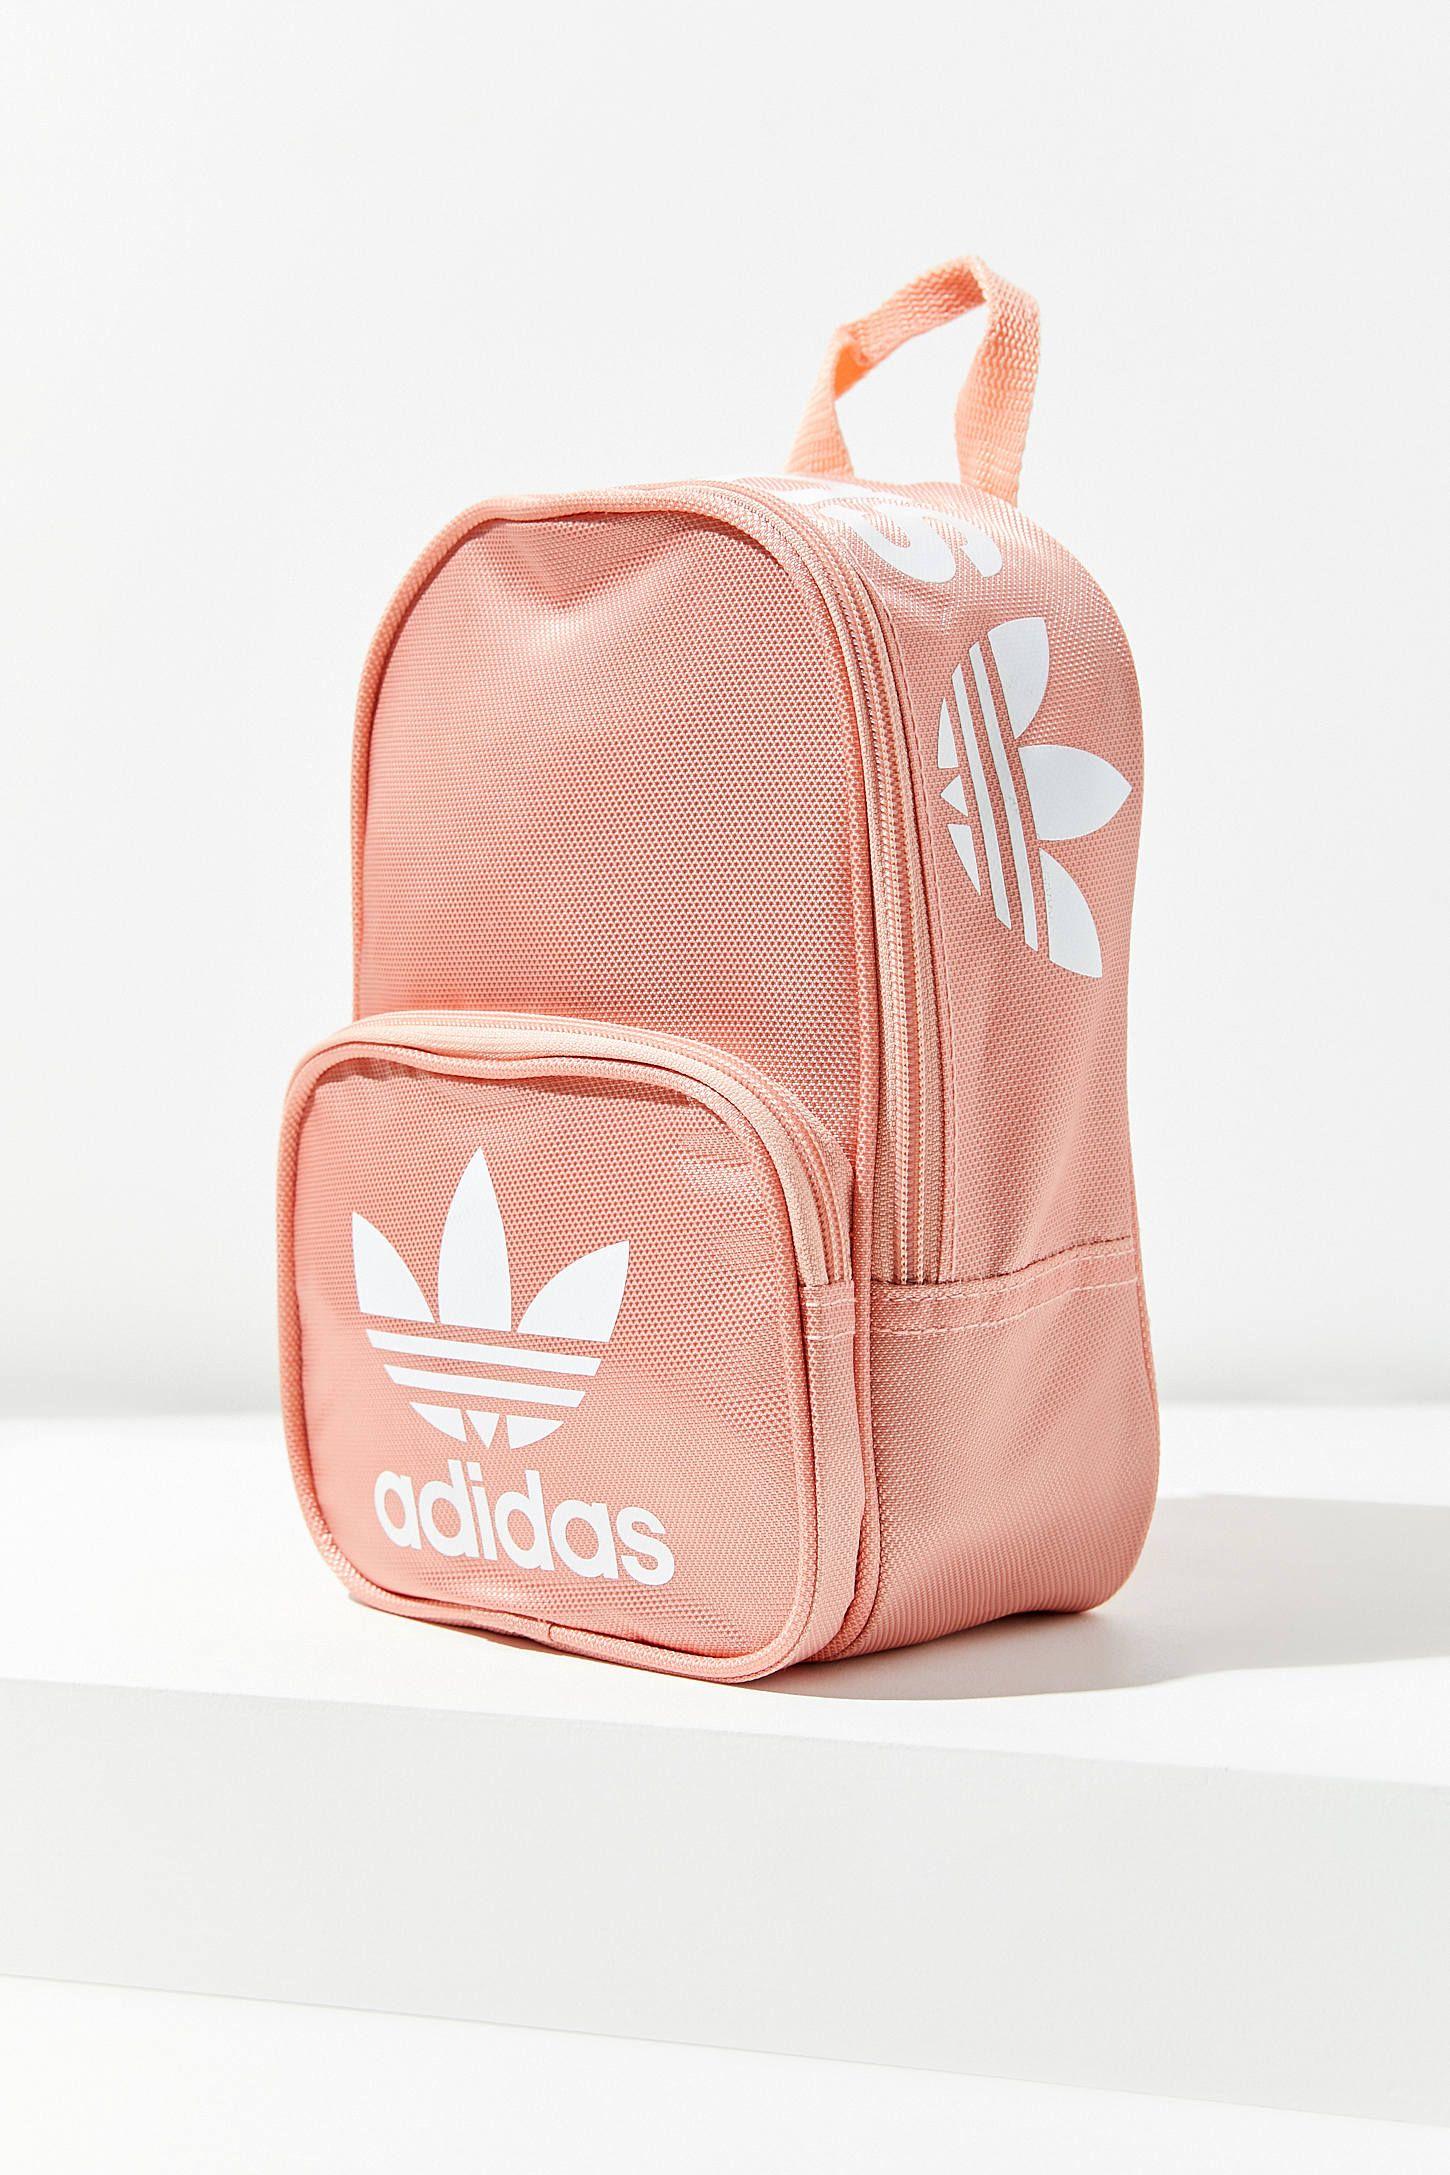 adidas Originals Santiago Mini Backpack   Mochila adidas ...